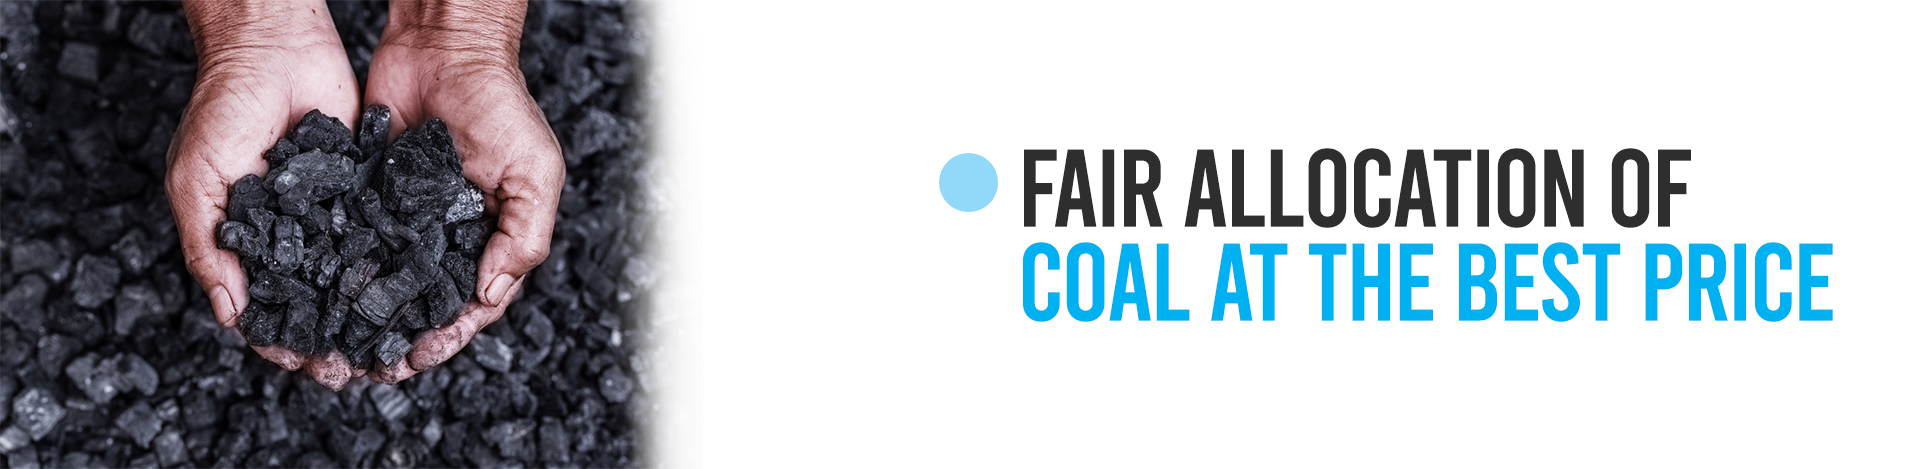 Auction Platforms for Coal